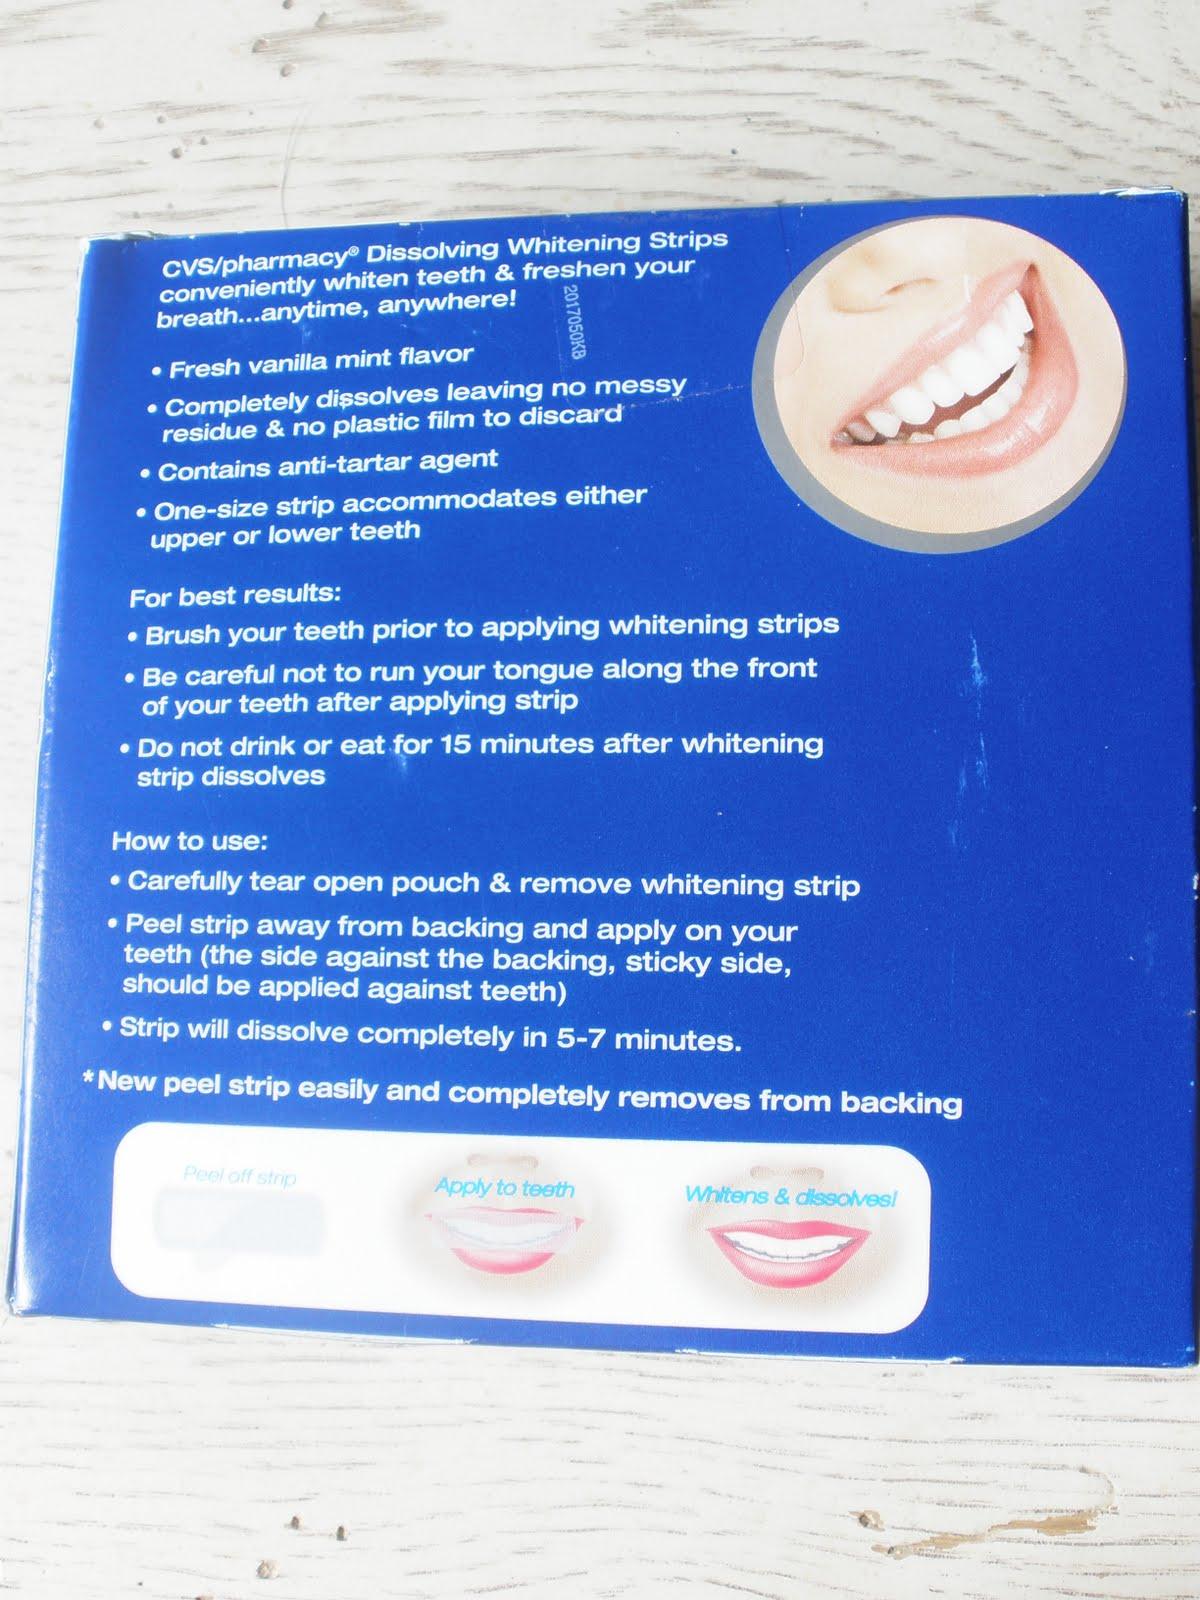 Cosmeticsbycaroline Review Cvs Dissolving Whitening Strips